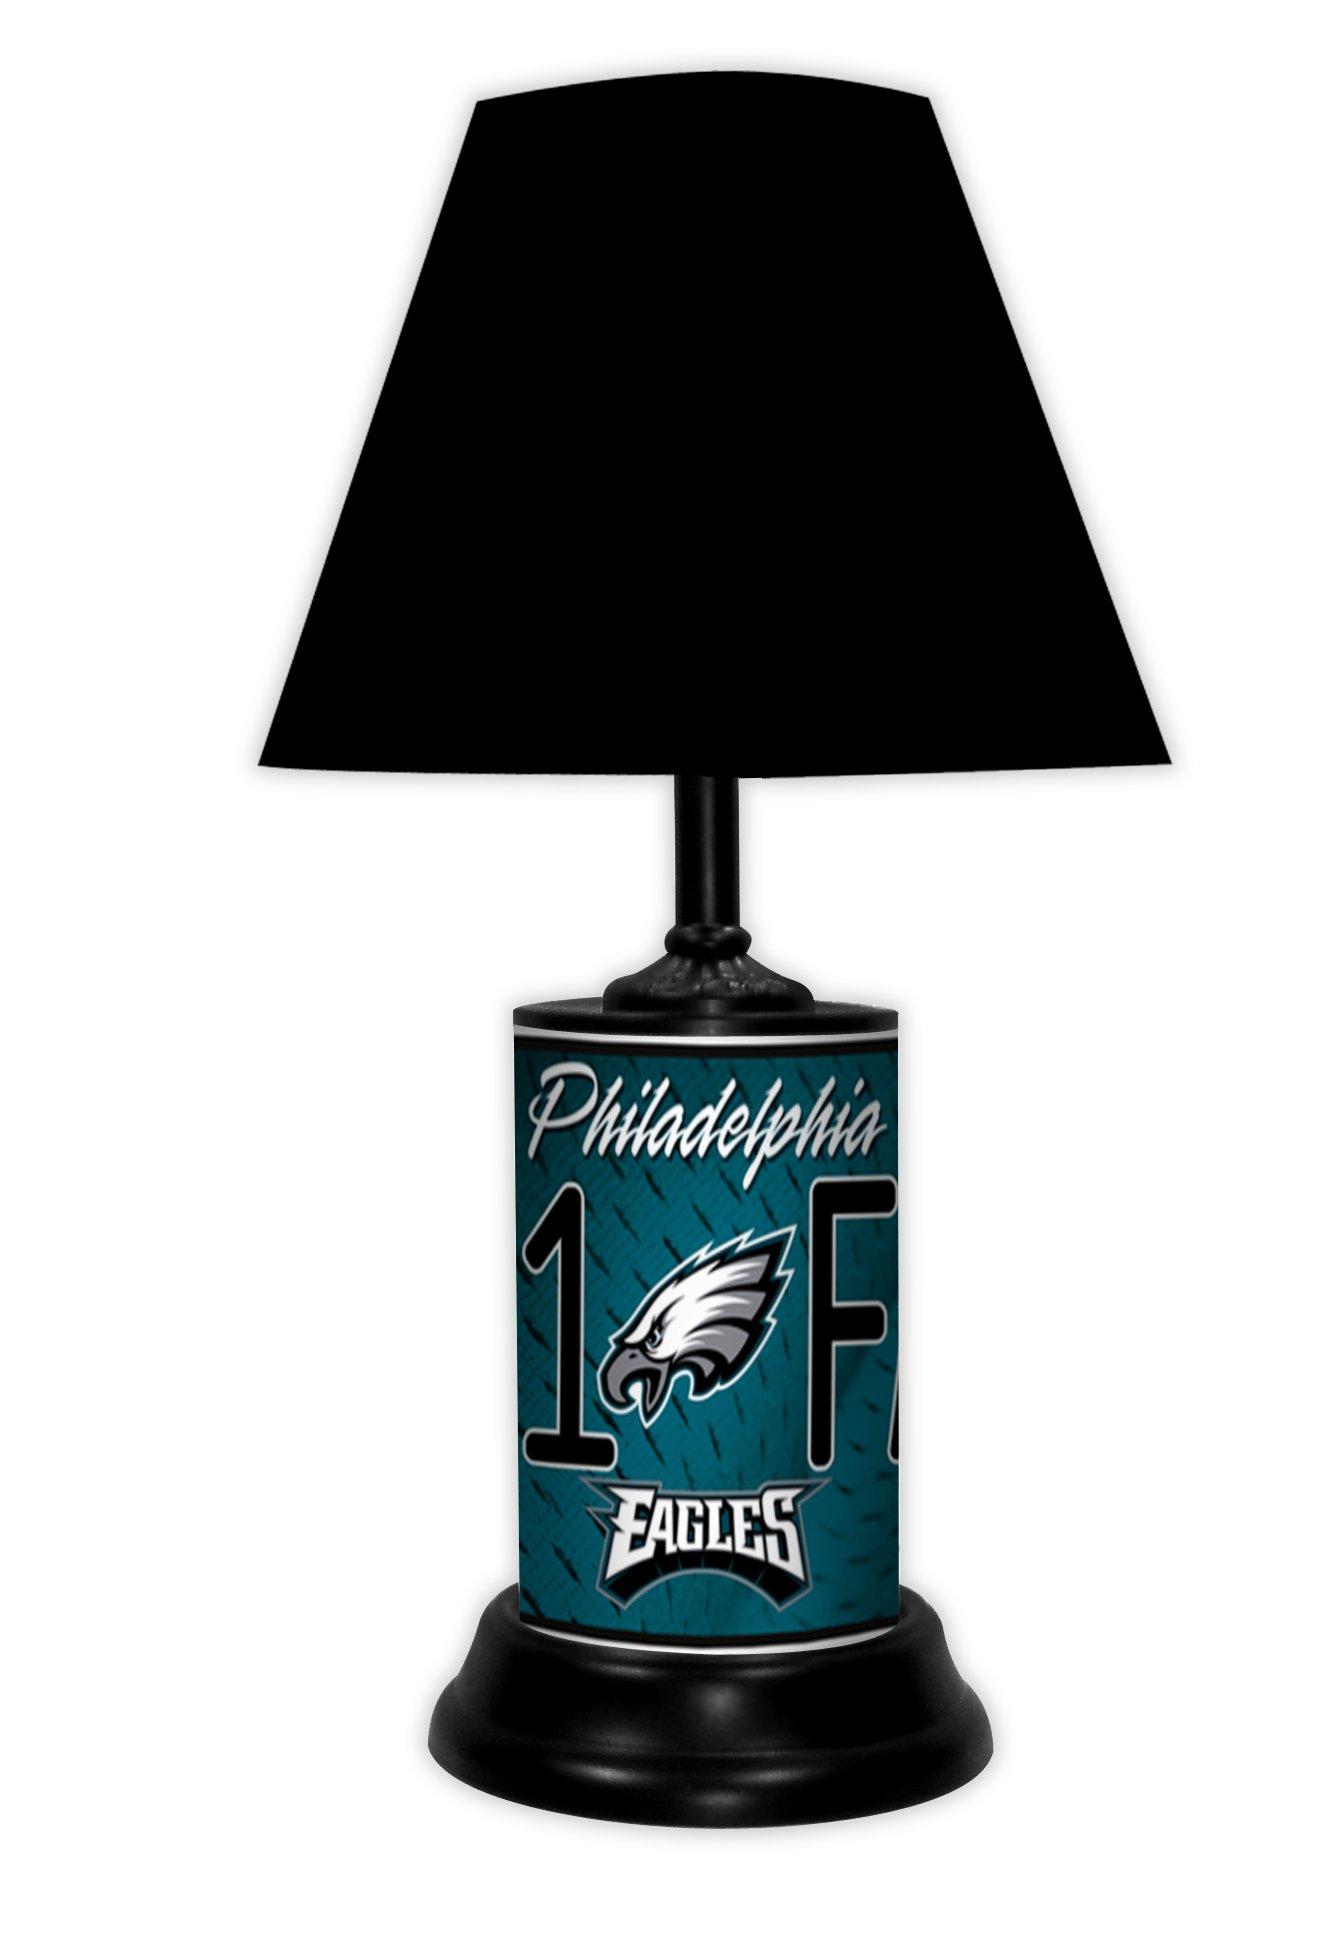 Philadelphia Eagles Table LAMP